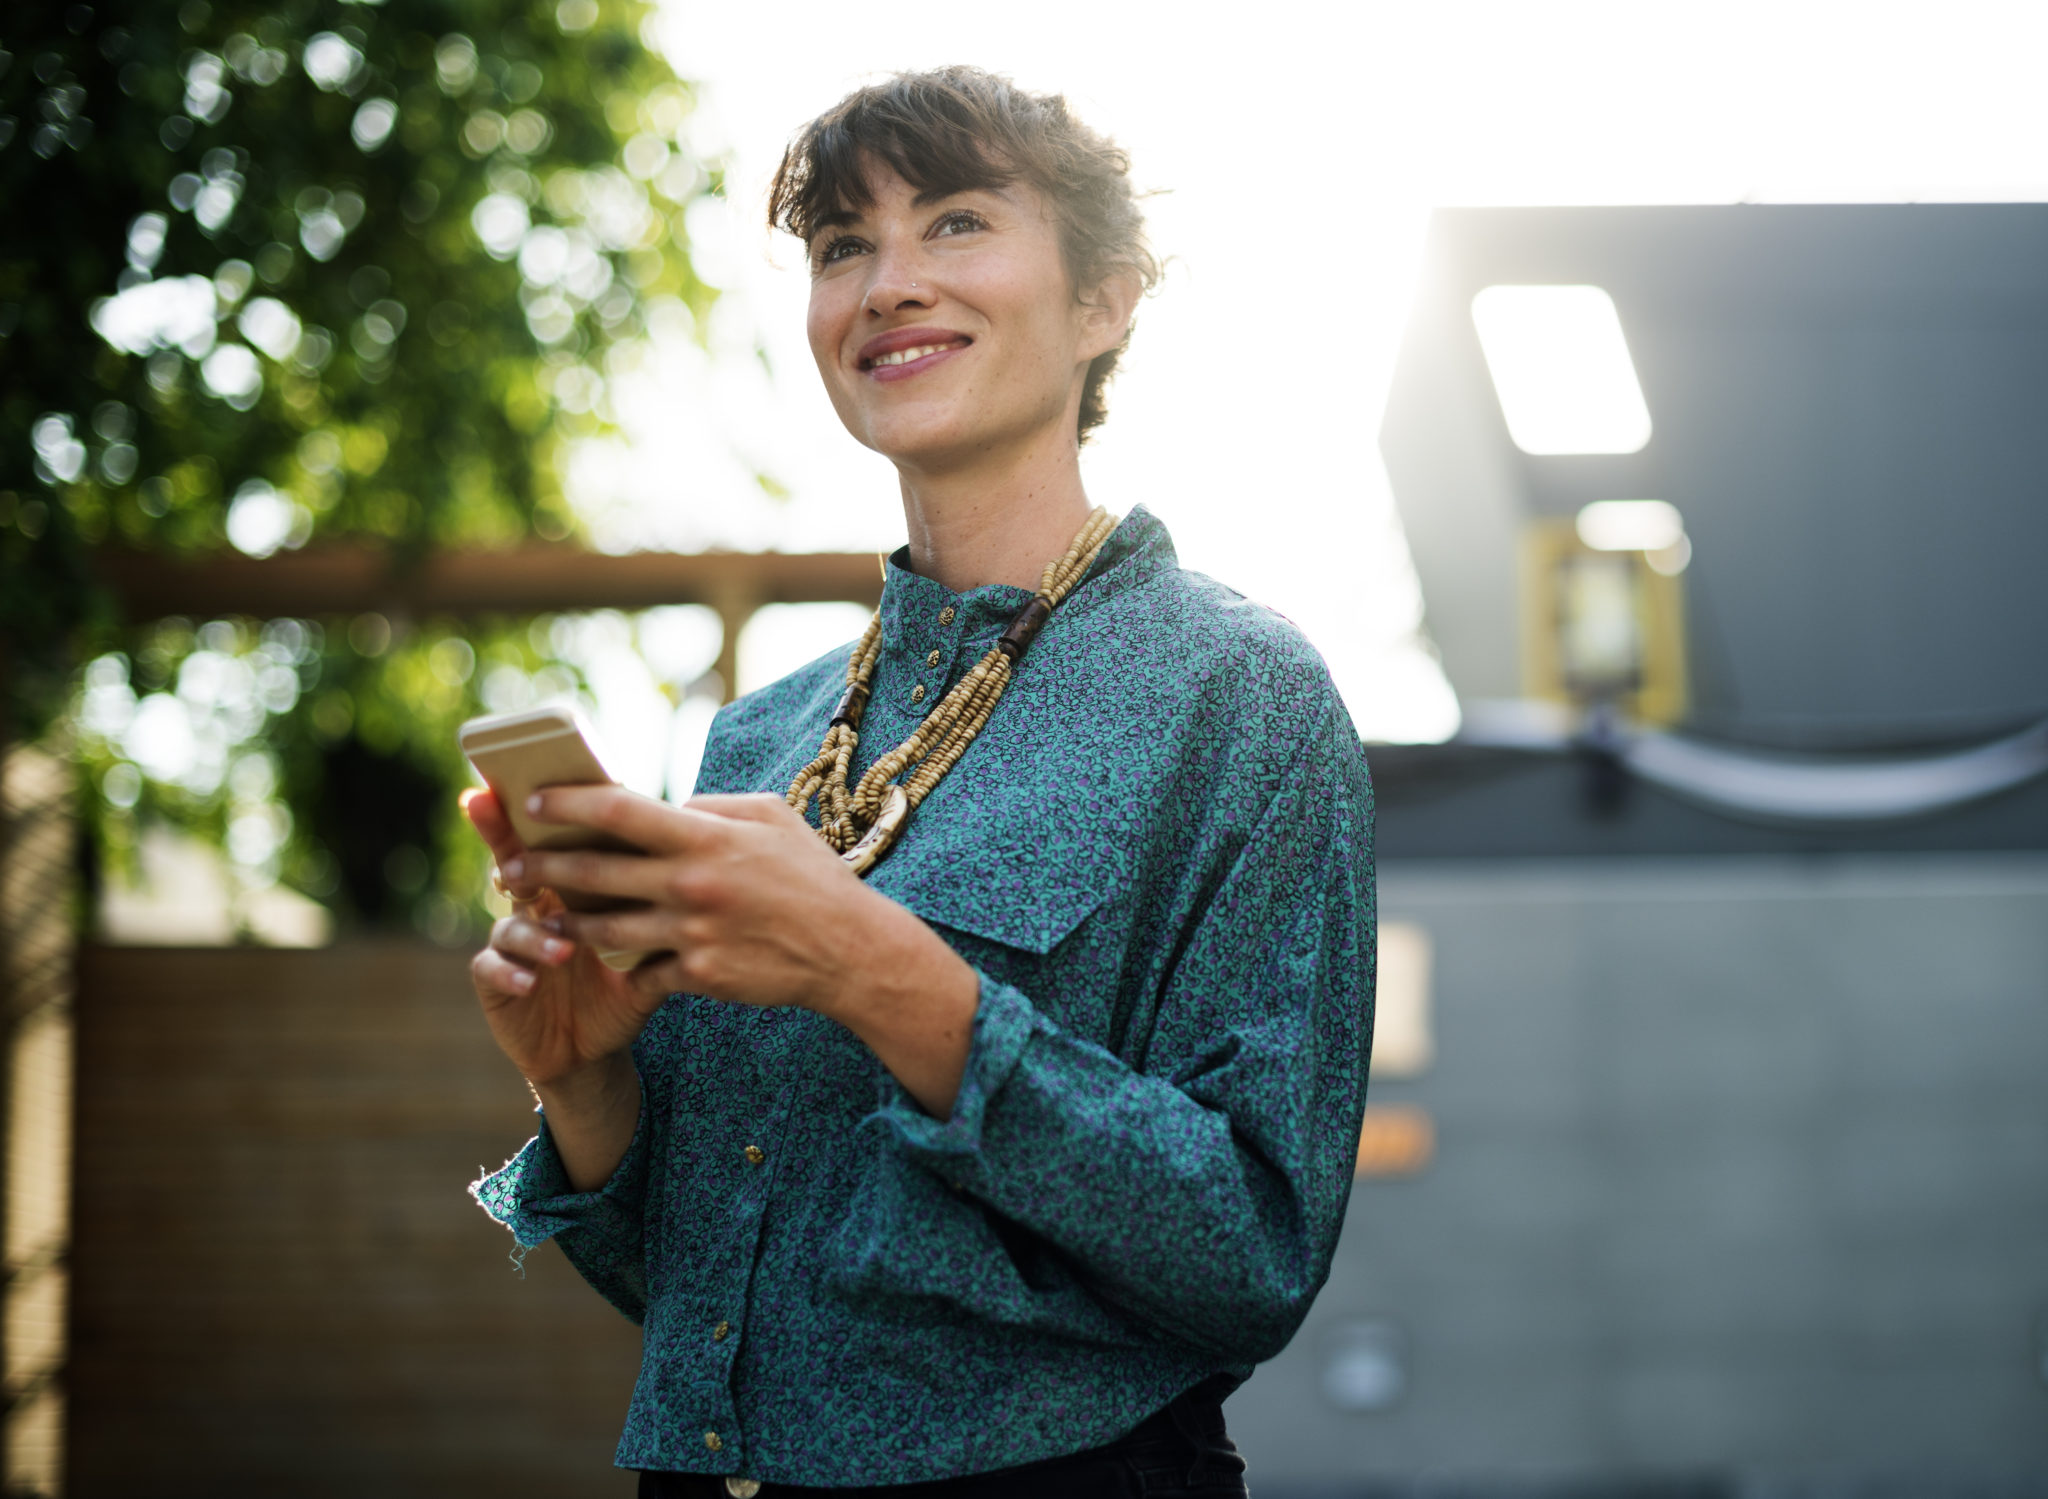 4 Reasons to Use Prepaid Phone Plan